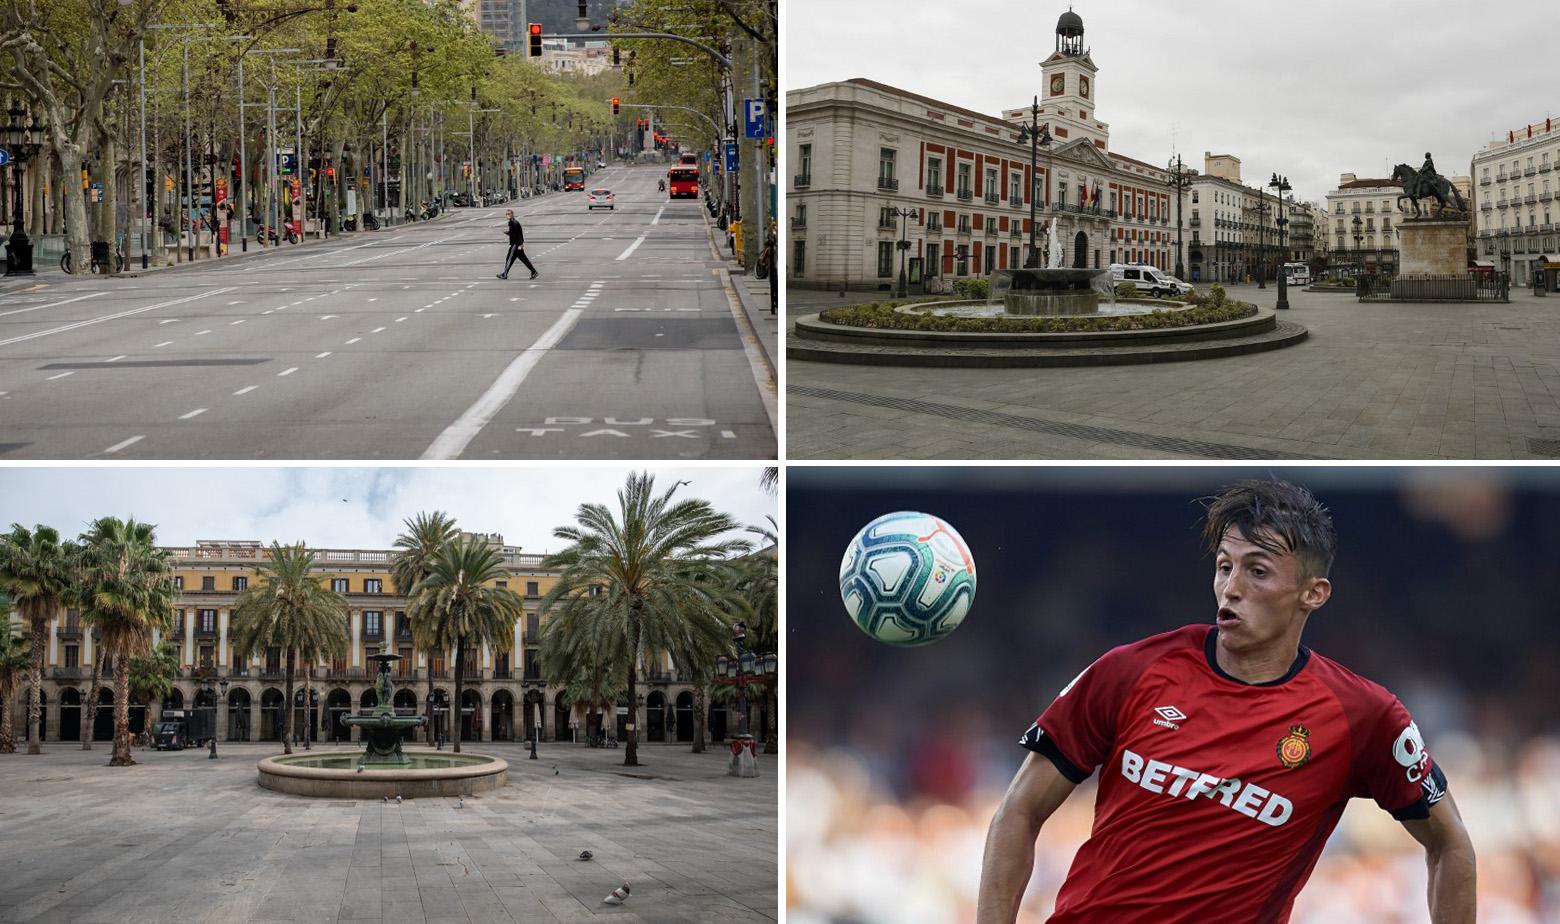 Prizori iz Španjolske i Ante Budimir